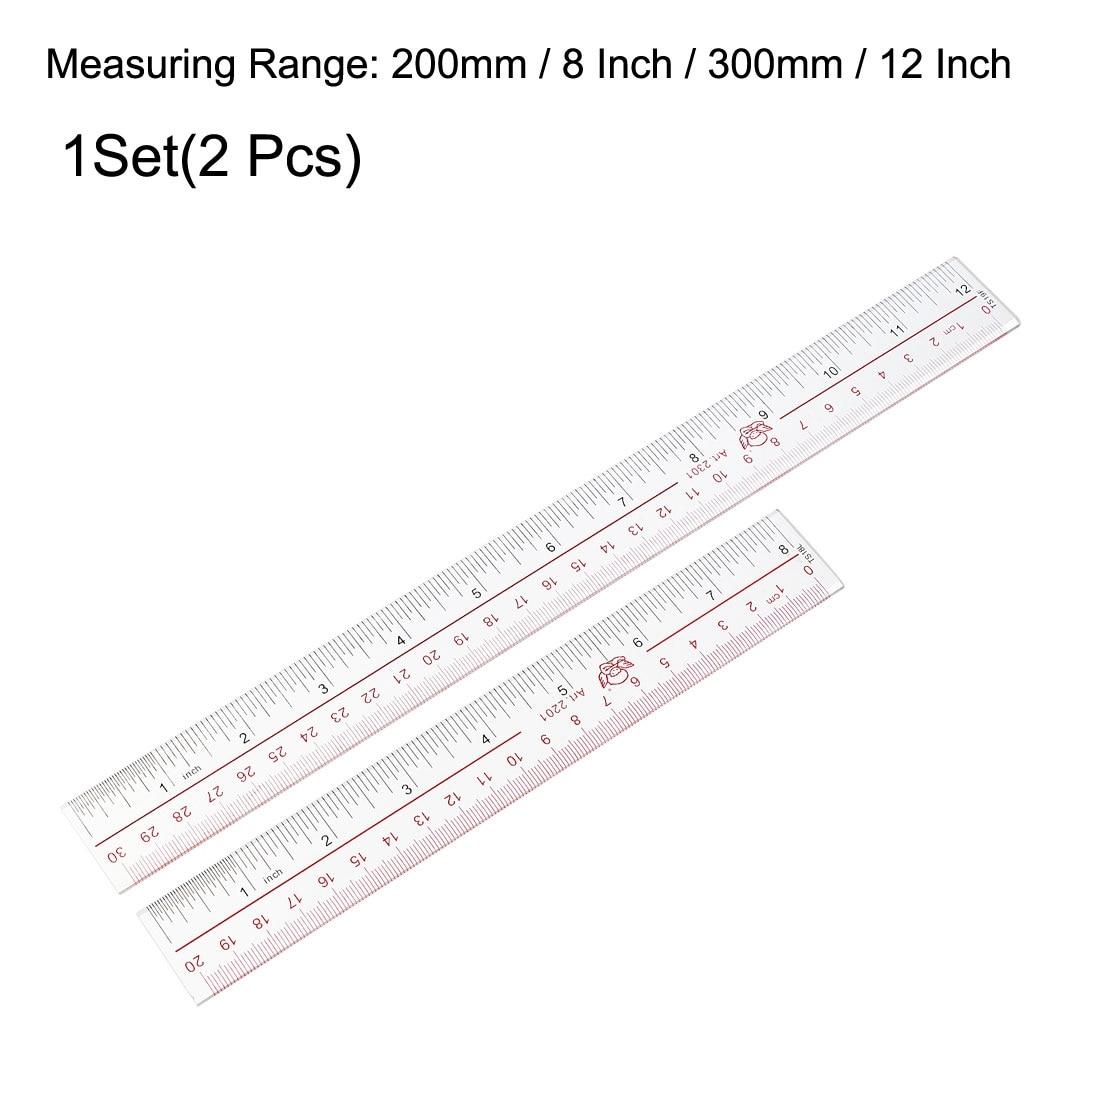 Ruler Plastic Clear Shatter-resistant 12inch 300mm Light Blue